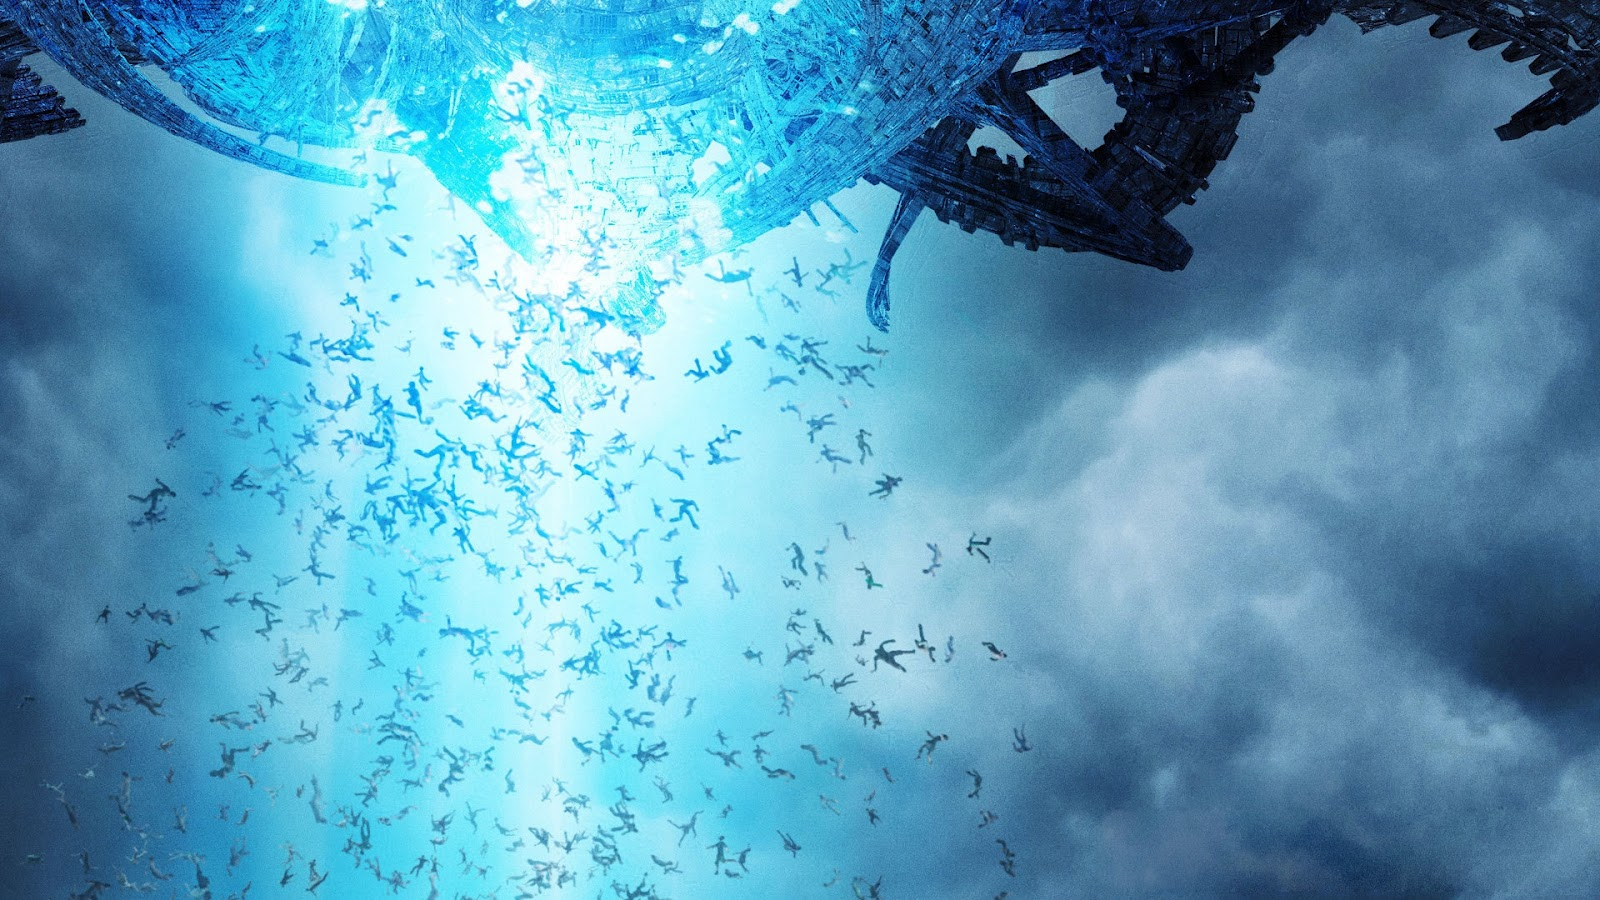 Skyline Movie Review - MoviesOnline